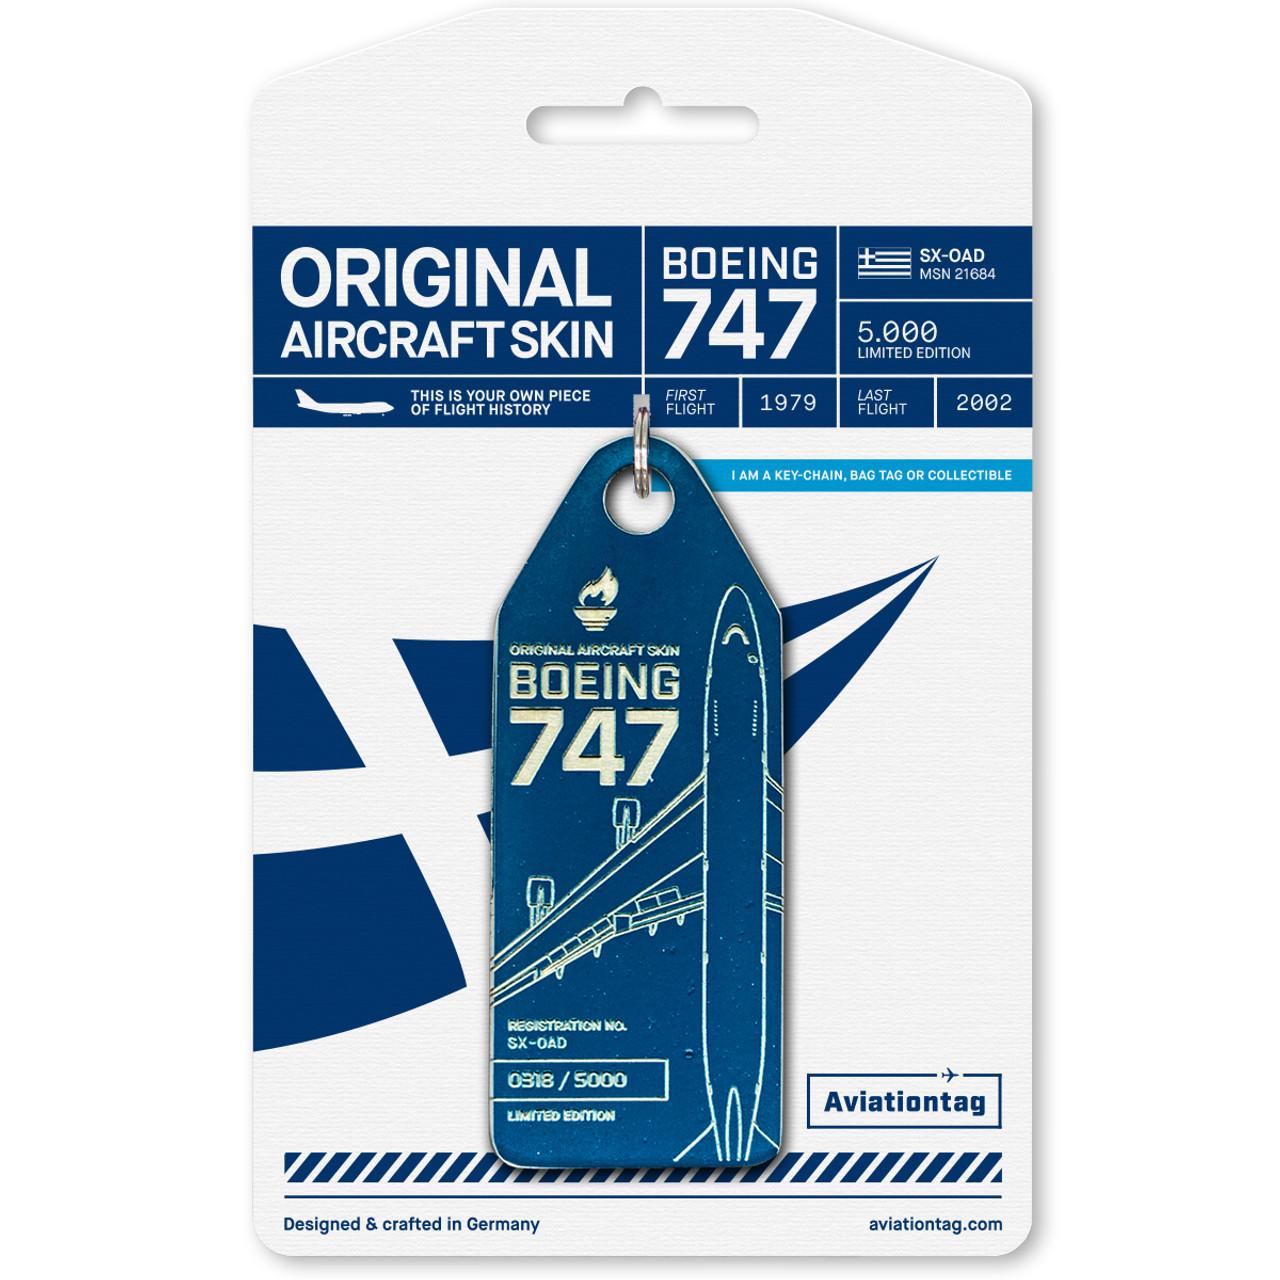 Olympic Airways AviationTag 747 Keychain